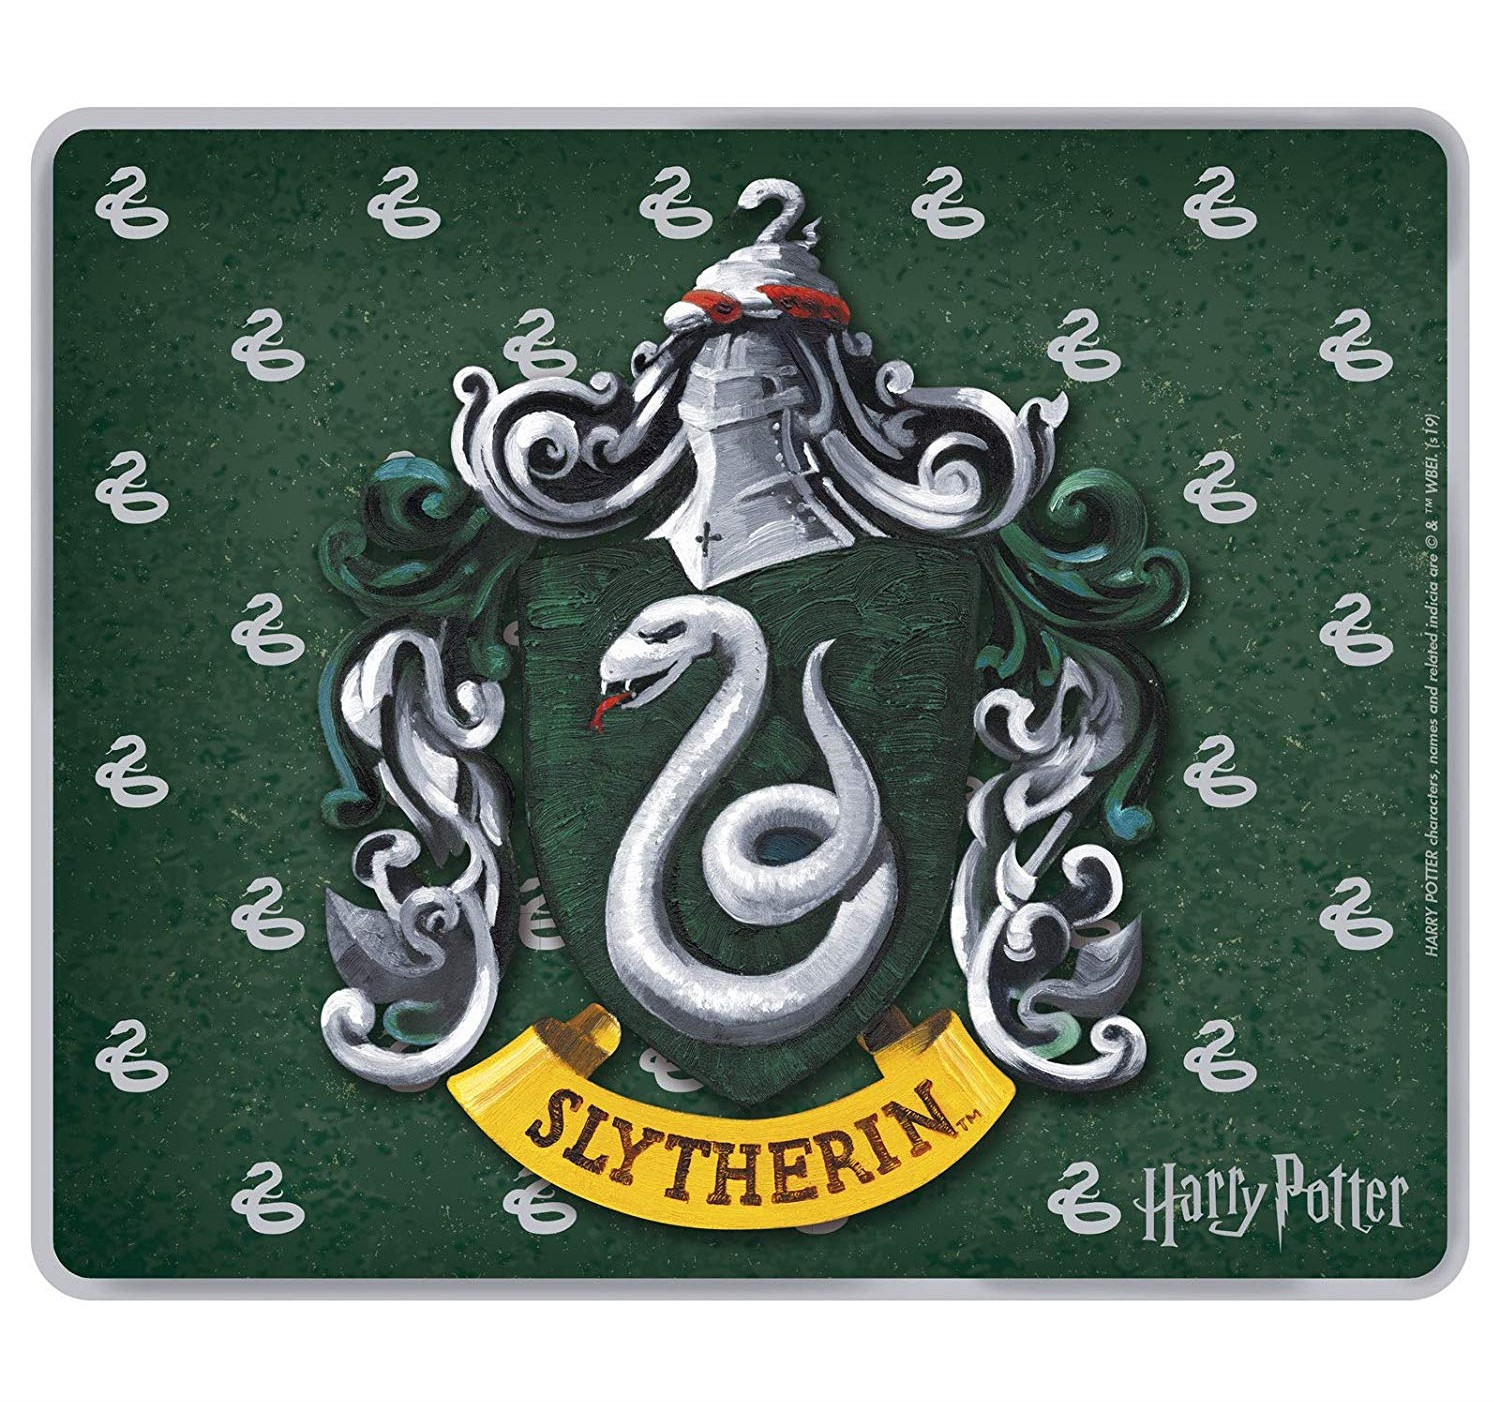 Vaso Grande de  Slytherin Crest Harry Potter